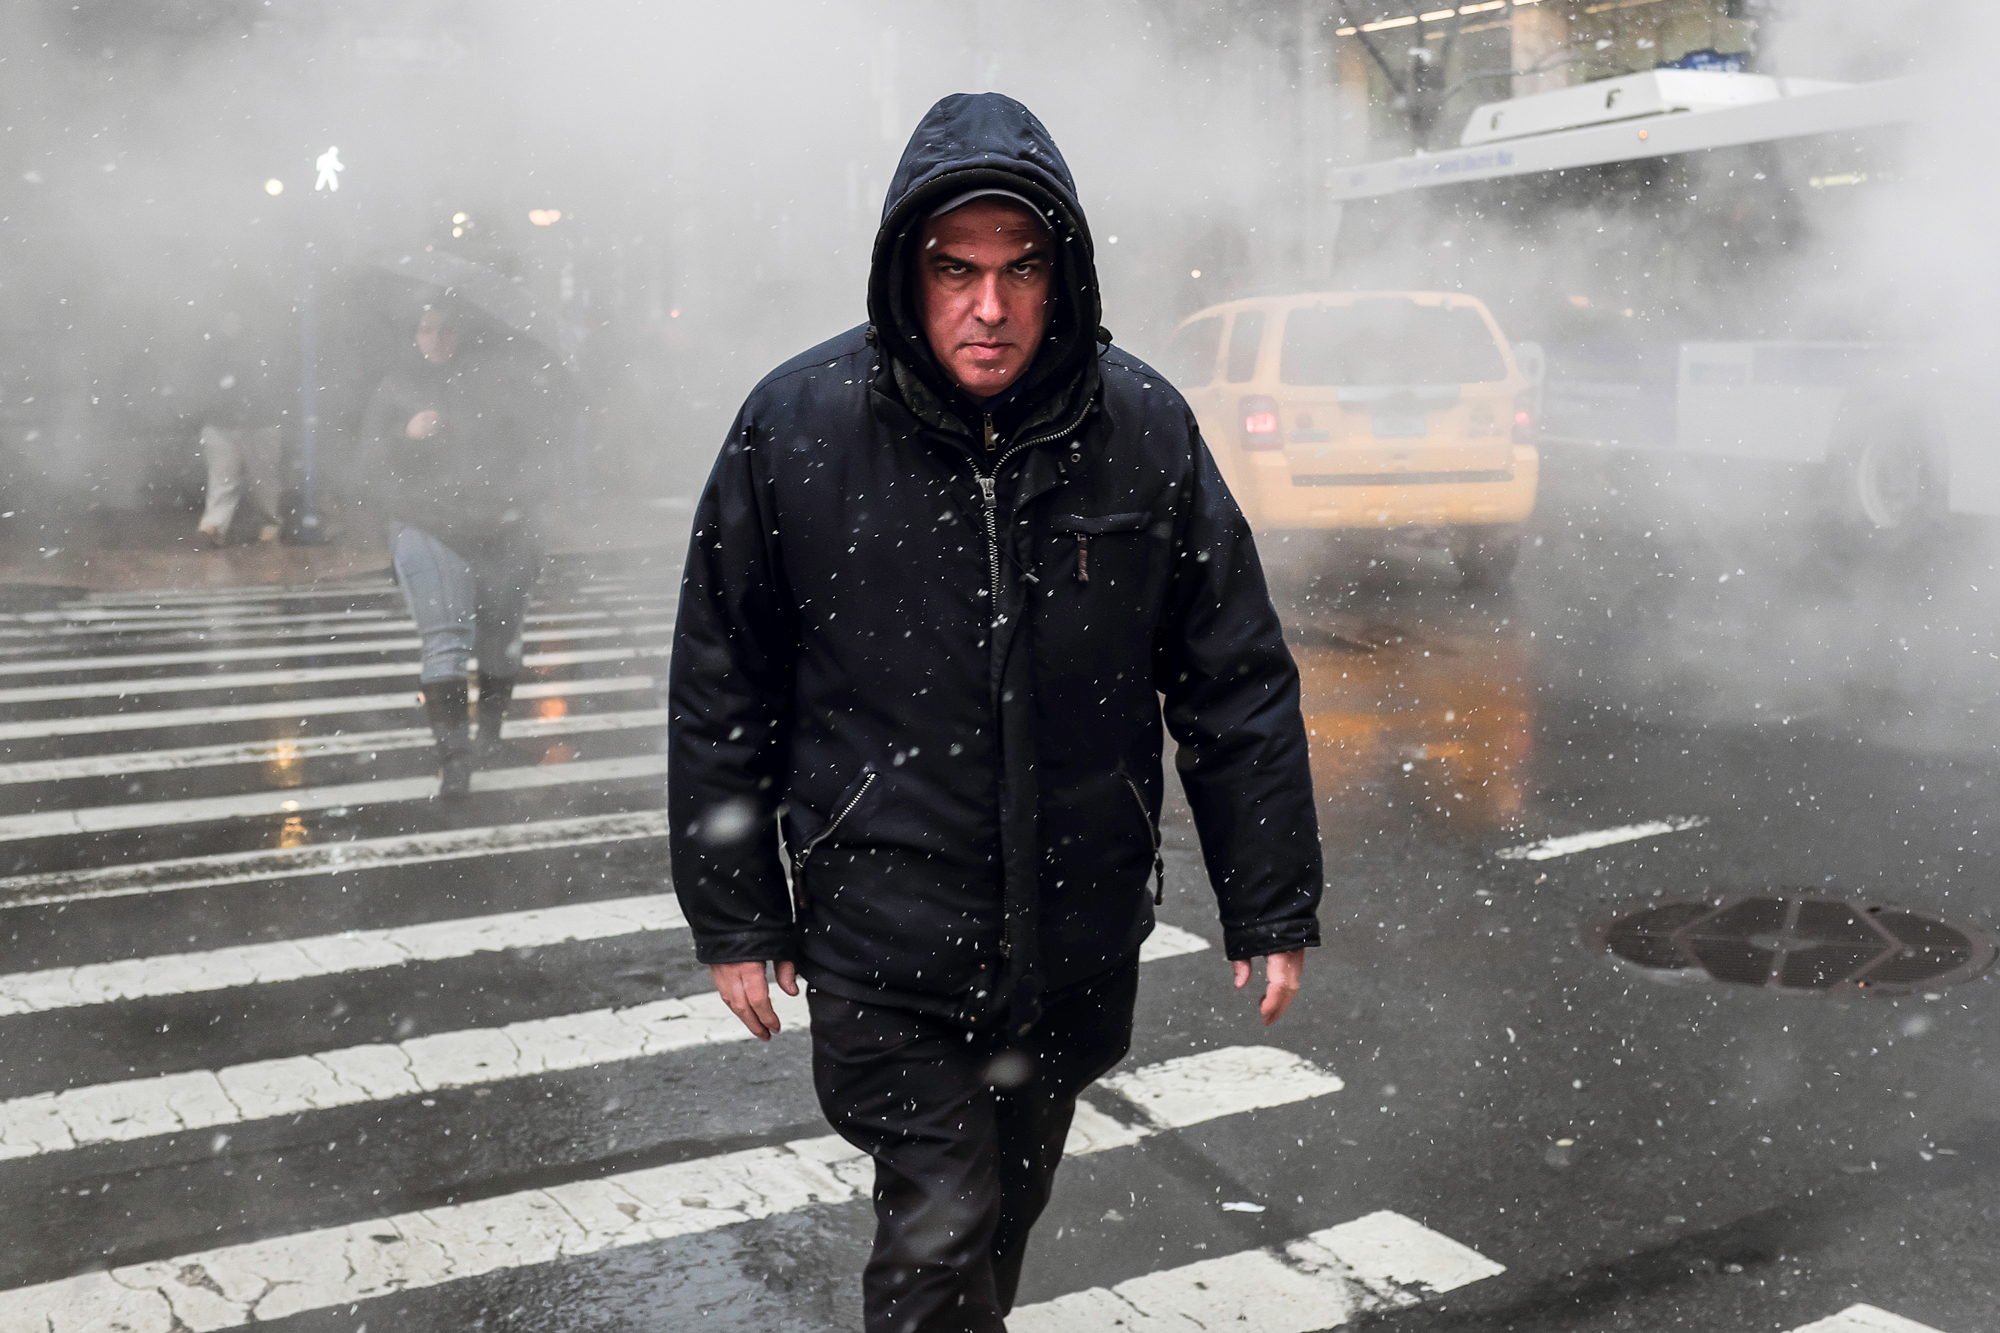 new-york-city-street-photographer-Zachary-Cabanas-6